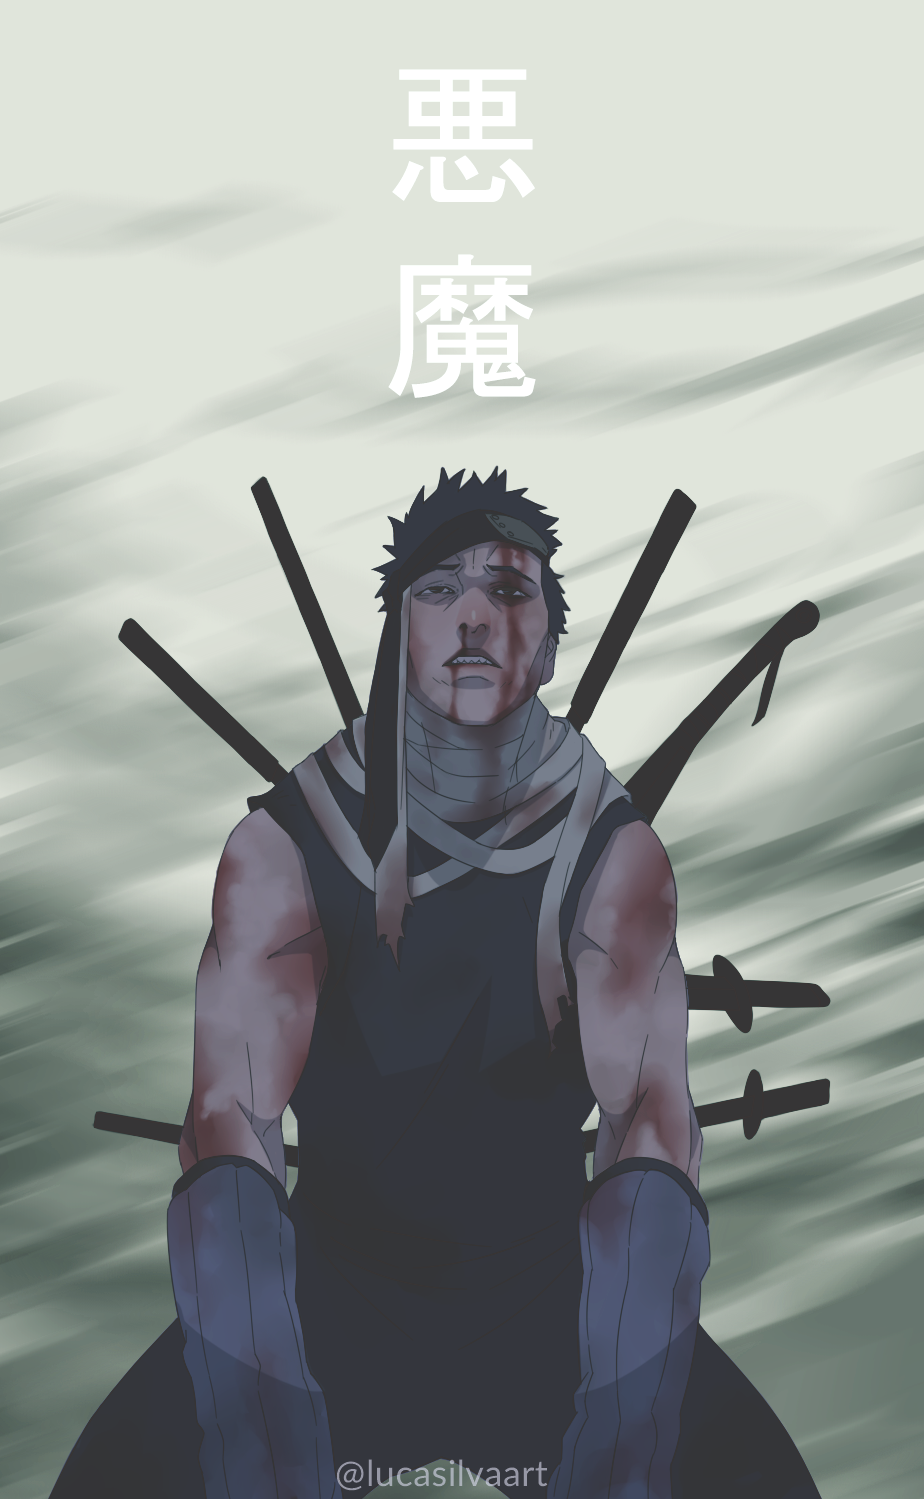 Lucas On Twitter Anime Naruto Naruto Manga Anime